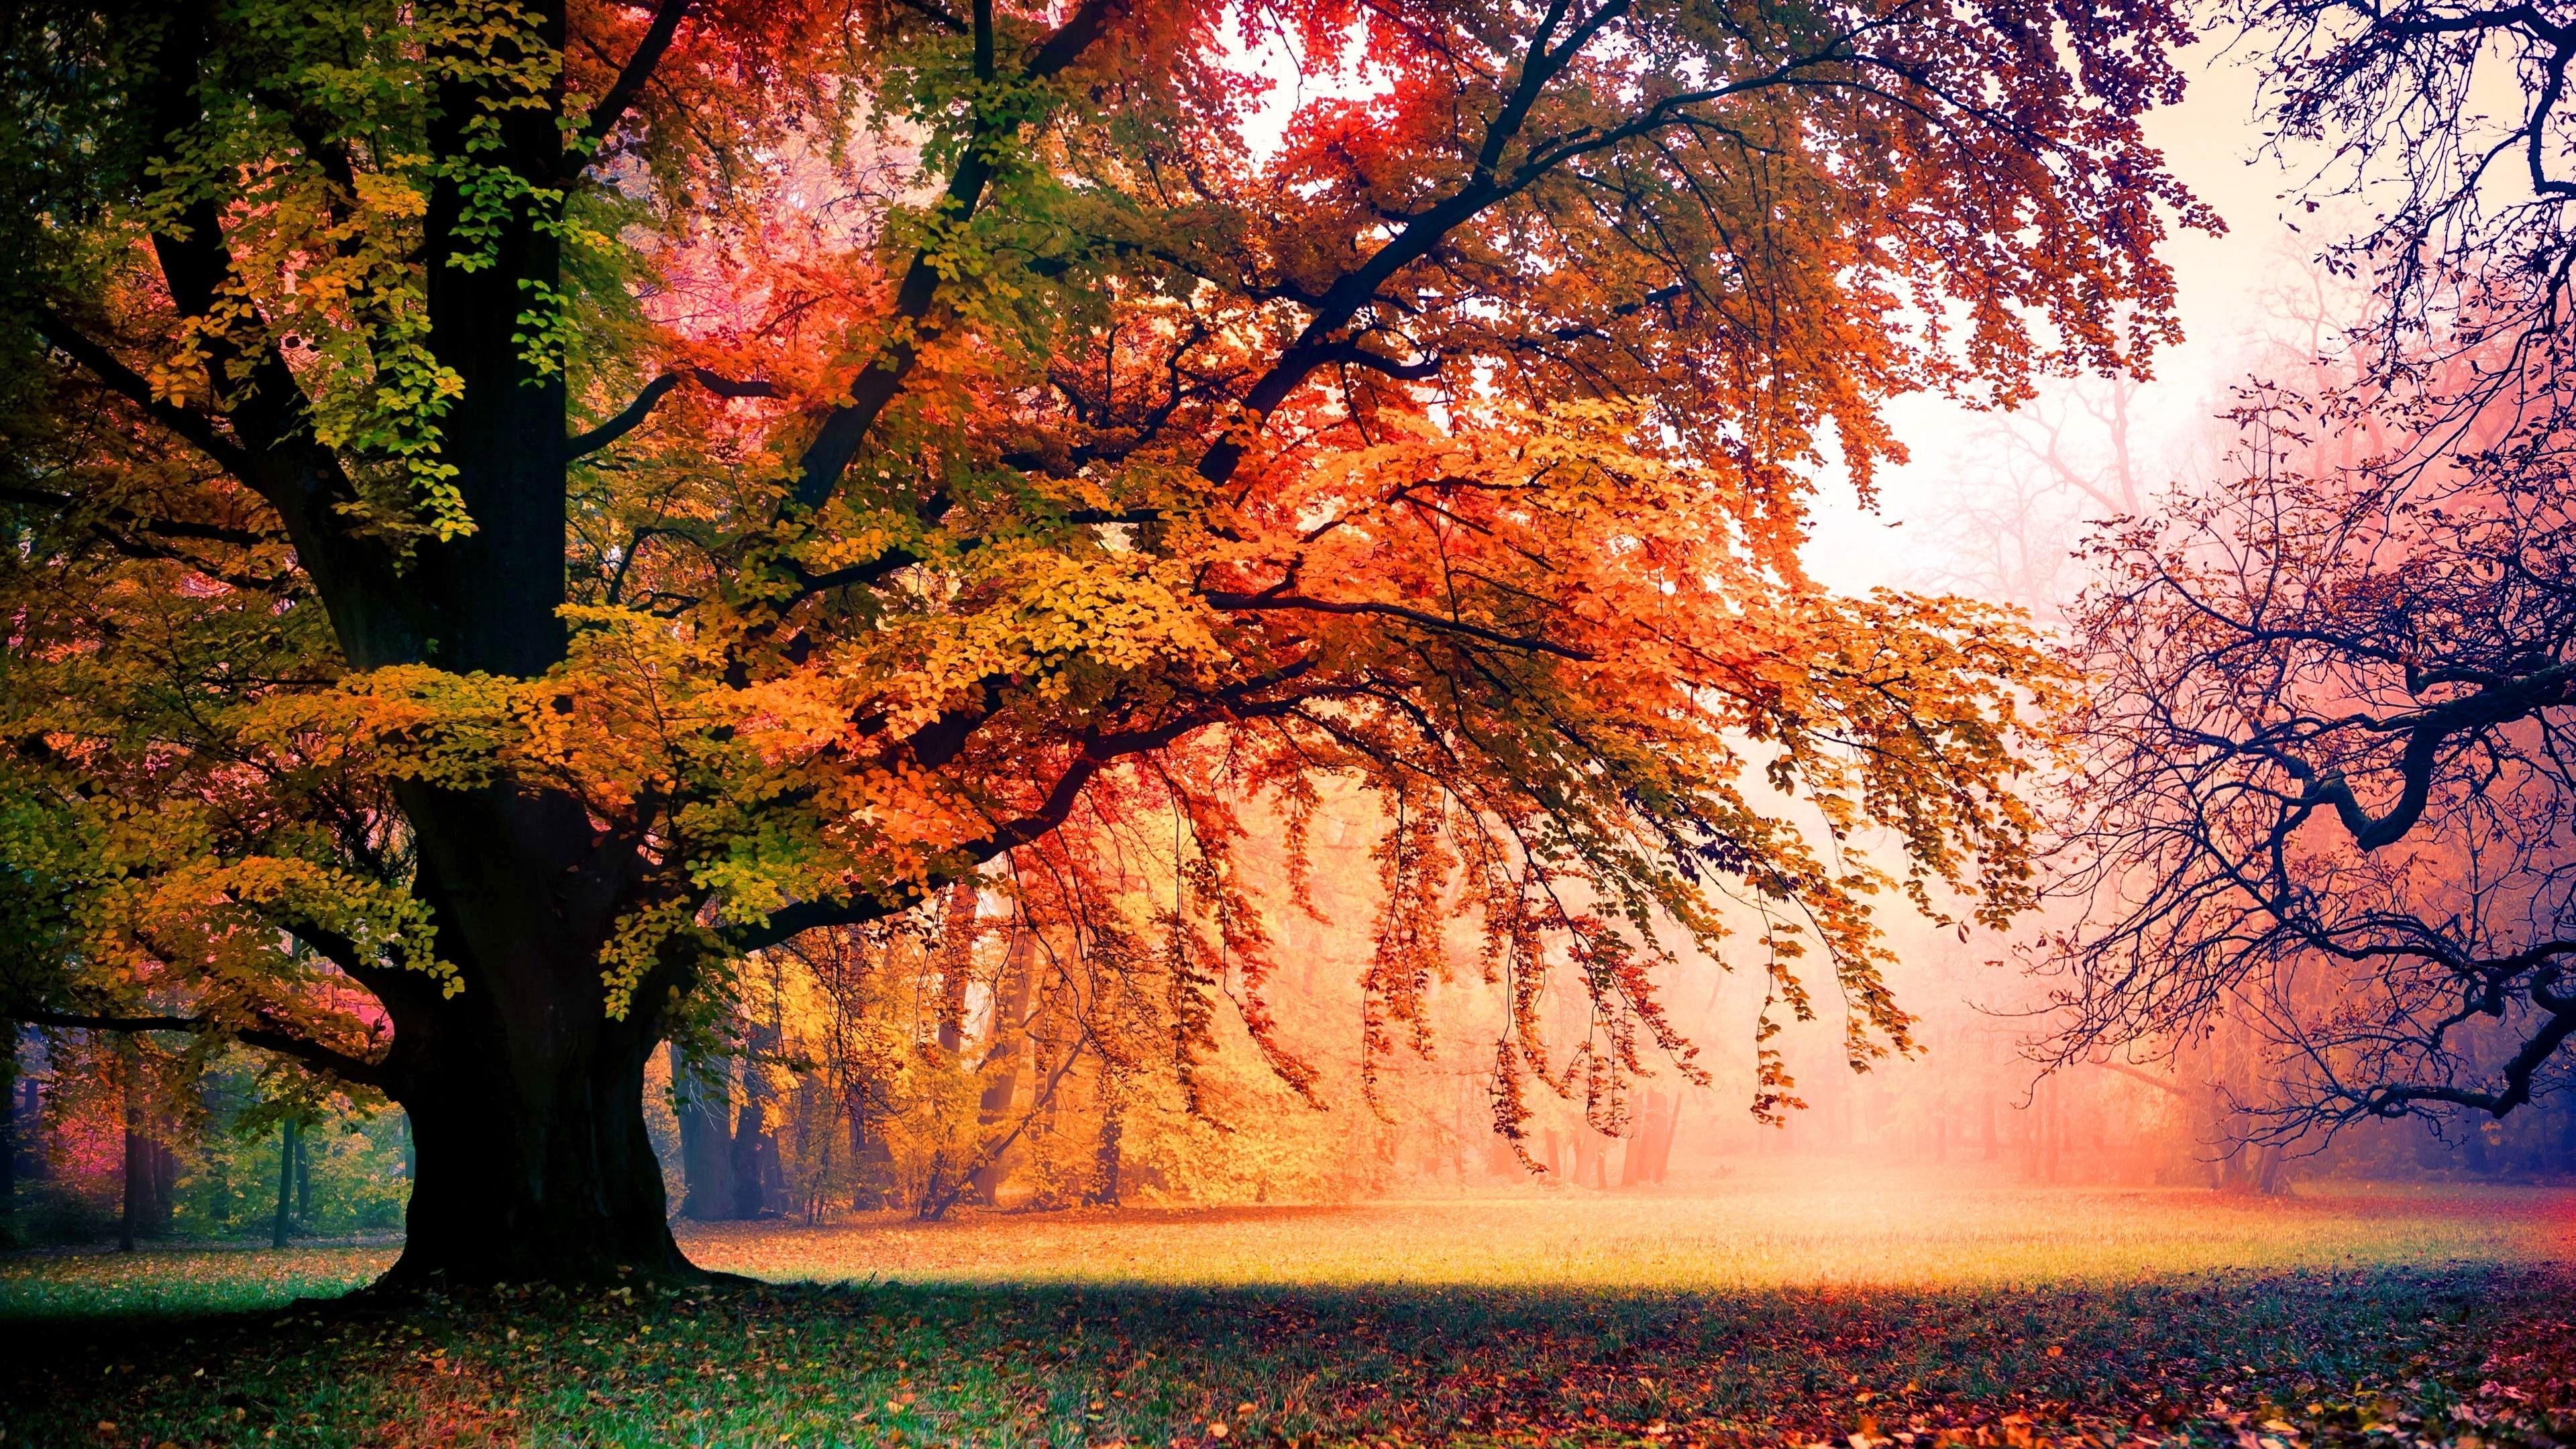 Colorful Autumn Trees Wallpaper   Wallpaper Studio 10   Tens of ...